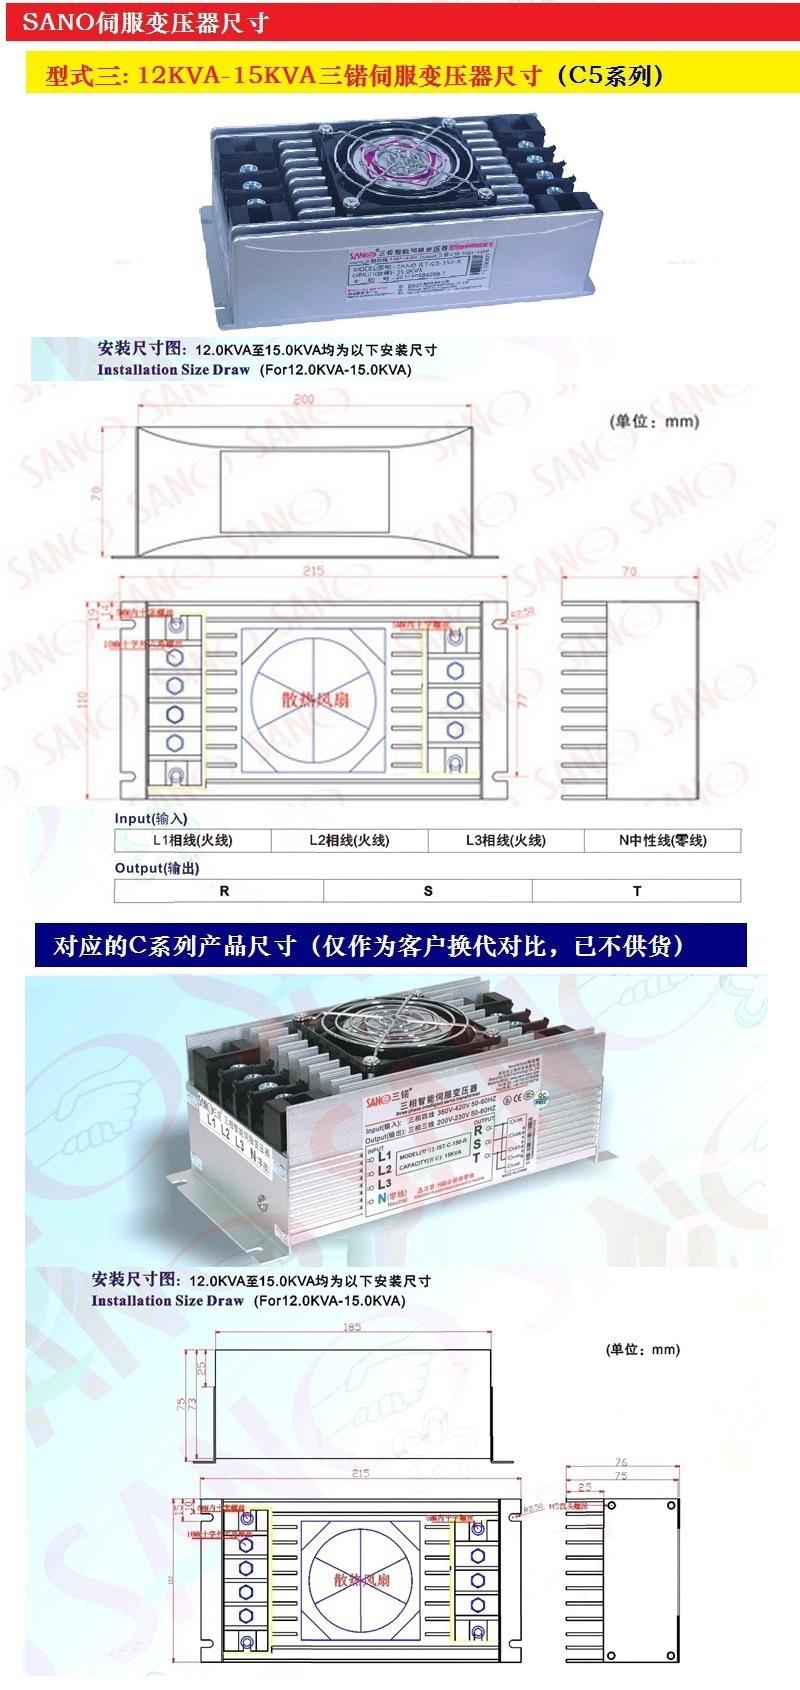 IST-C5-005伺服变压器0.5KVA三锘SANO伺服电子变压器380V转200V示例图5